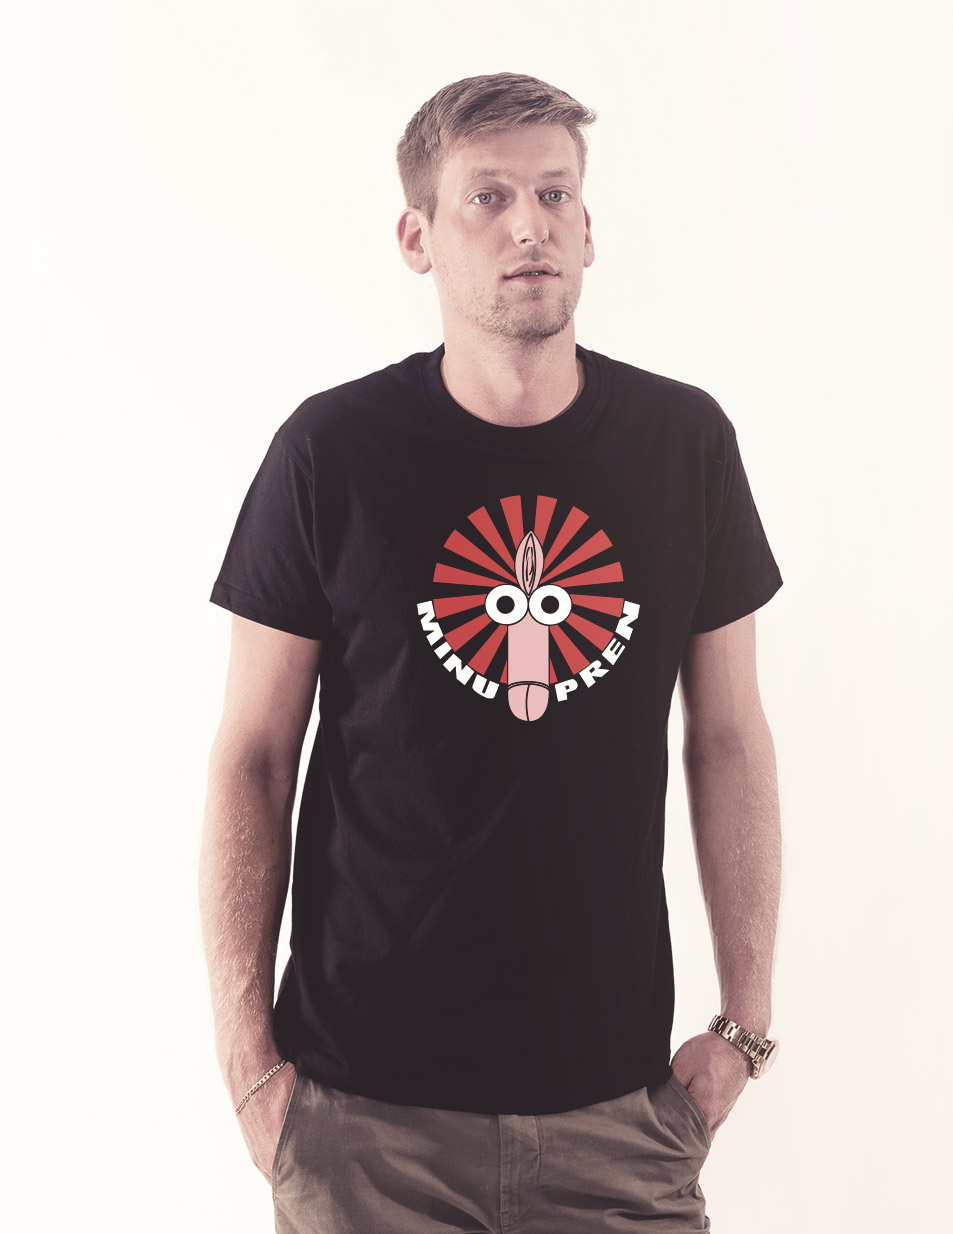 Fotzenpimmel Shirt mehrfarbig auf schwarz